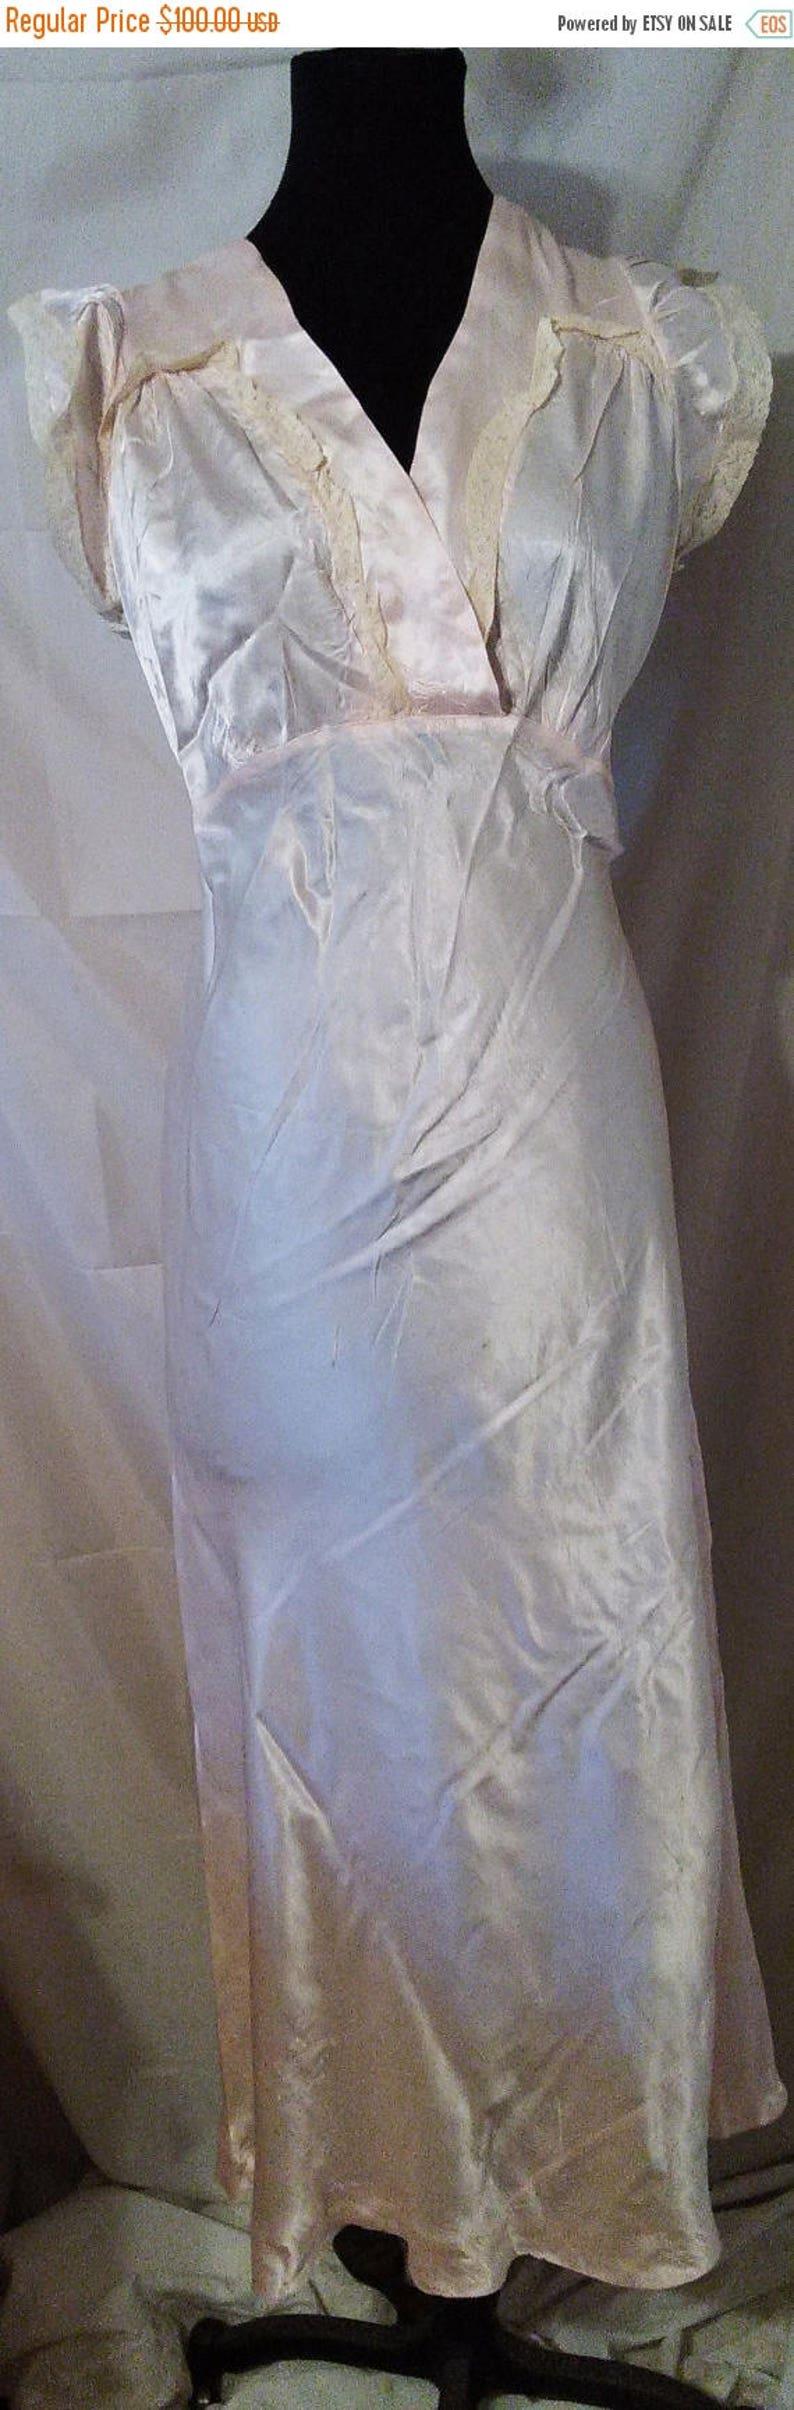 BIG HOLIDAY SALE-30s Silk Art Deco Nightgown-Bias-Size 8-Medium-40 Bust-Glam-Hollywood Regency-Hipster-NoS